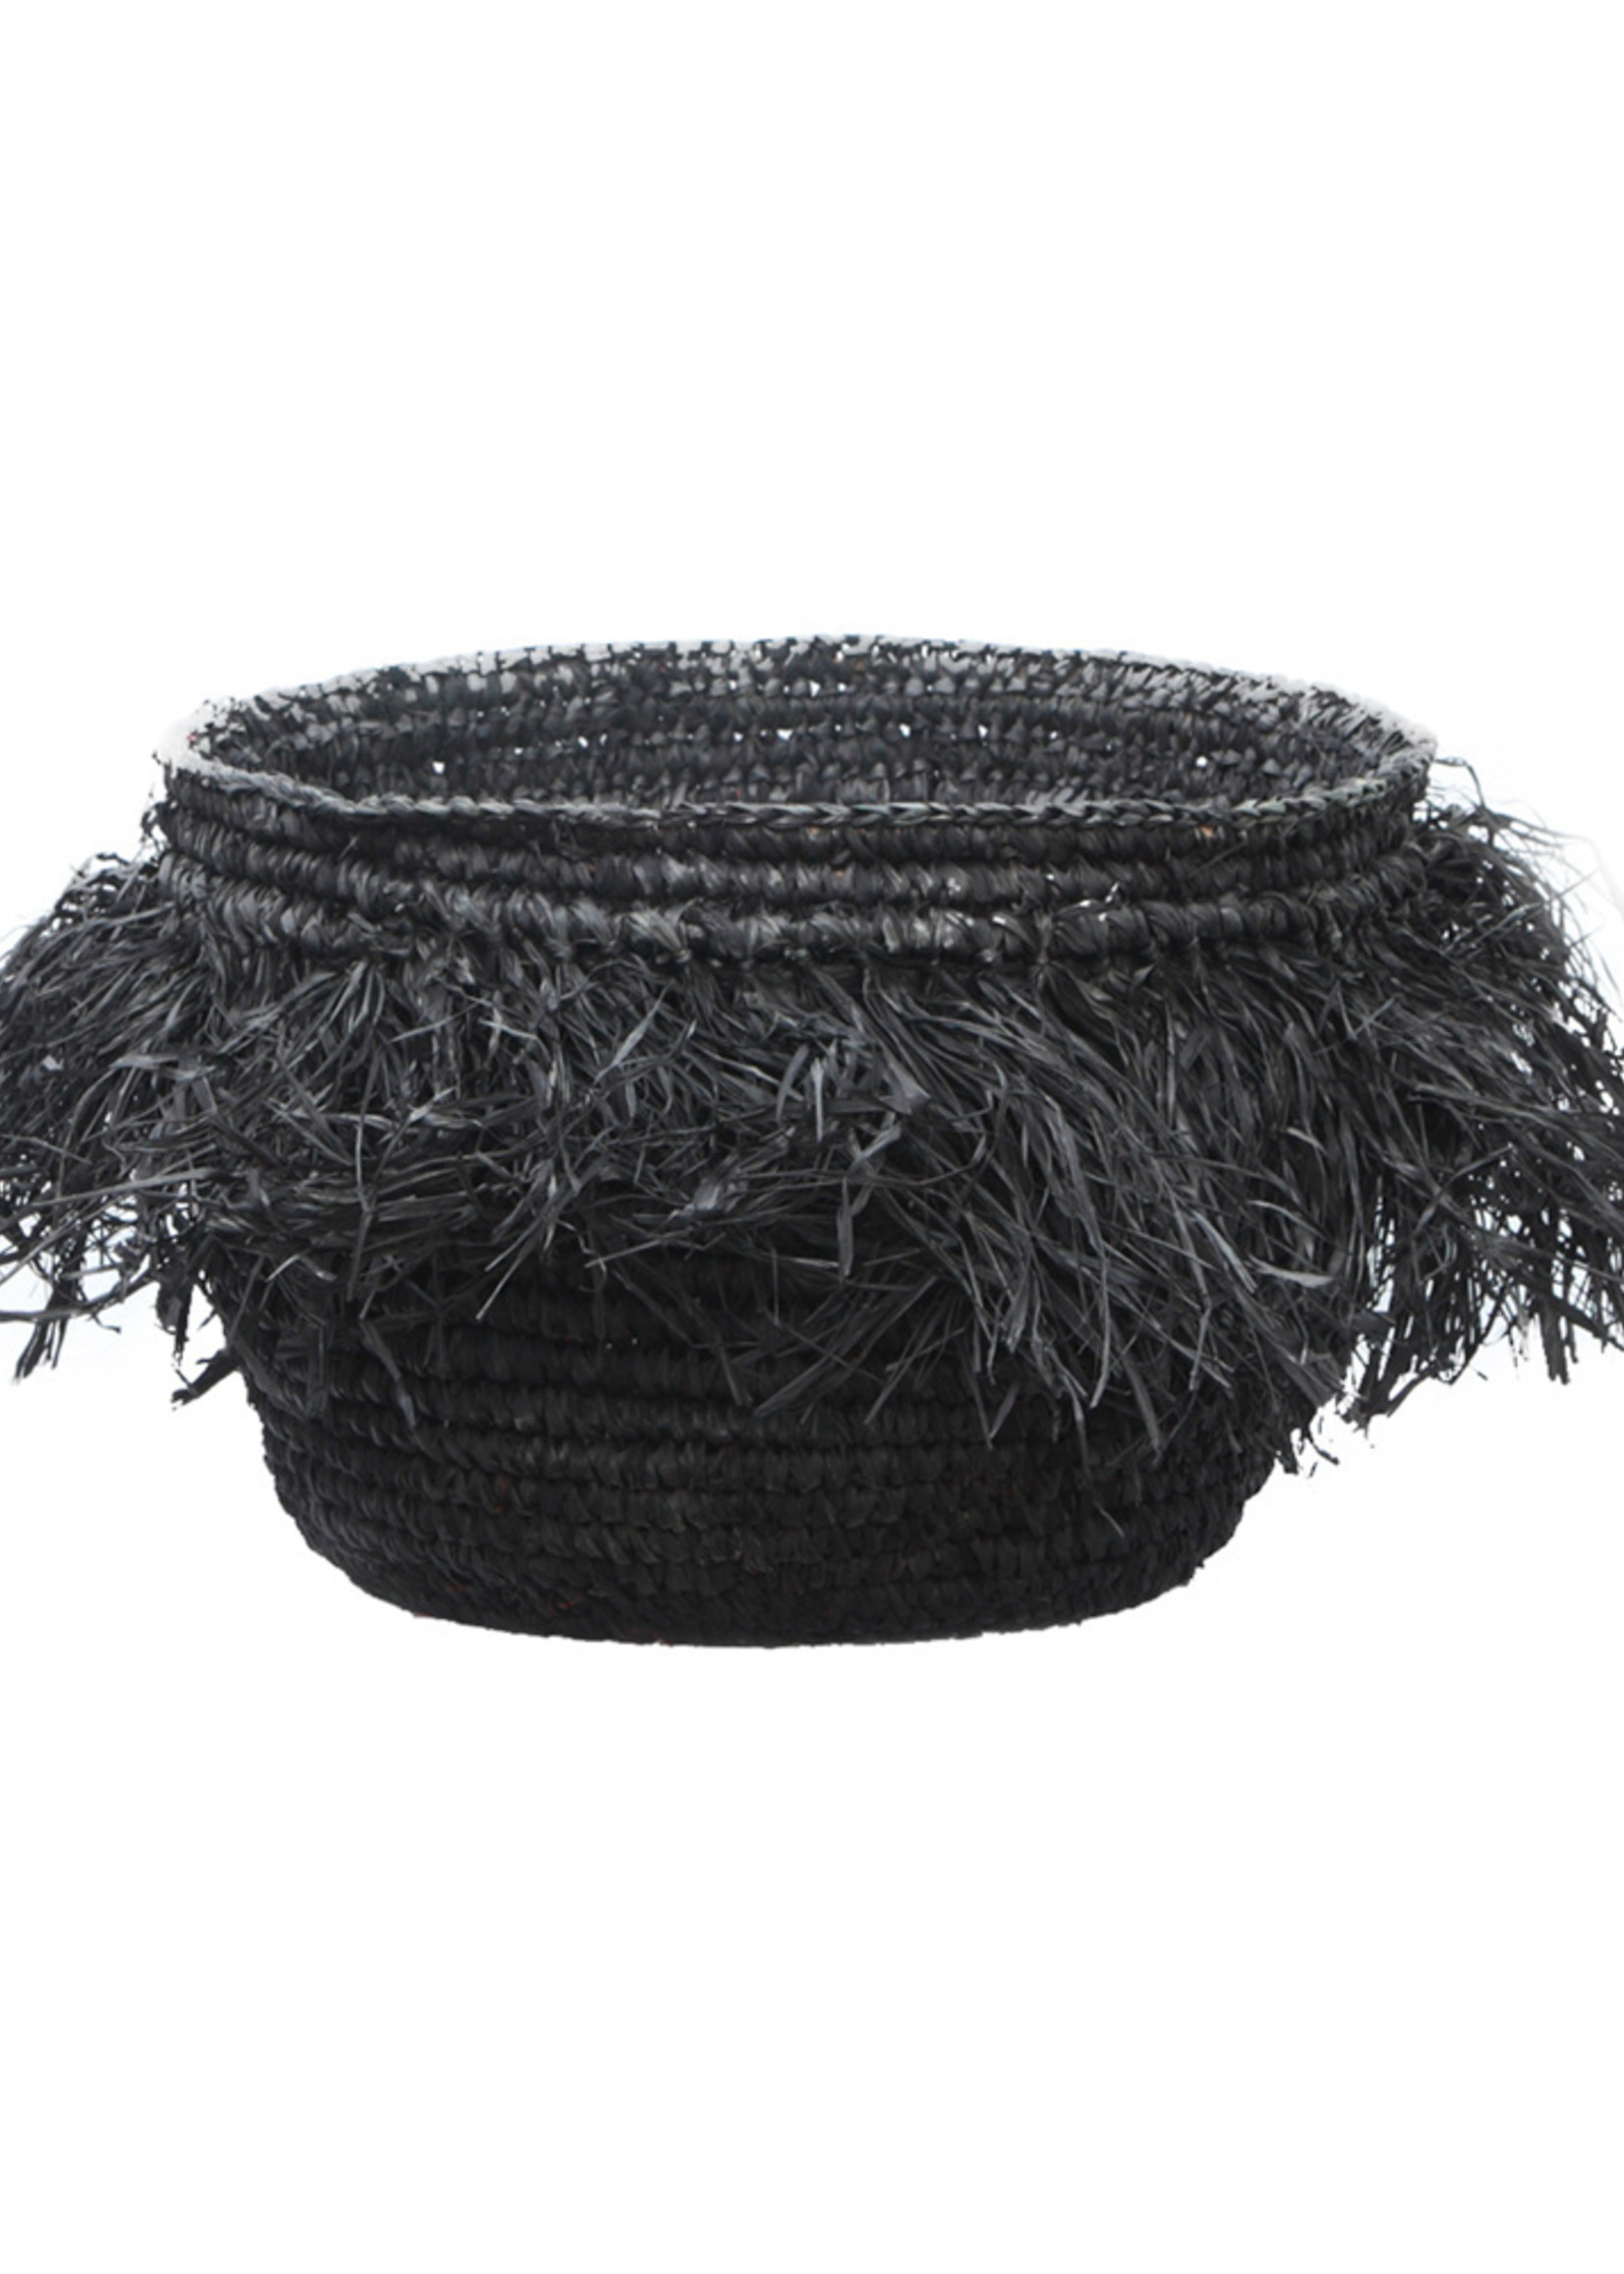 The Raffia Bowl - Black - M